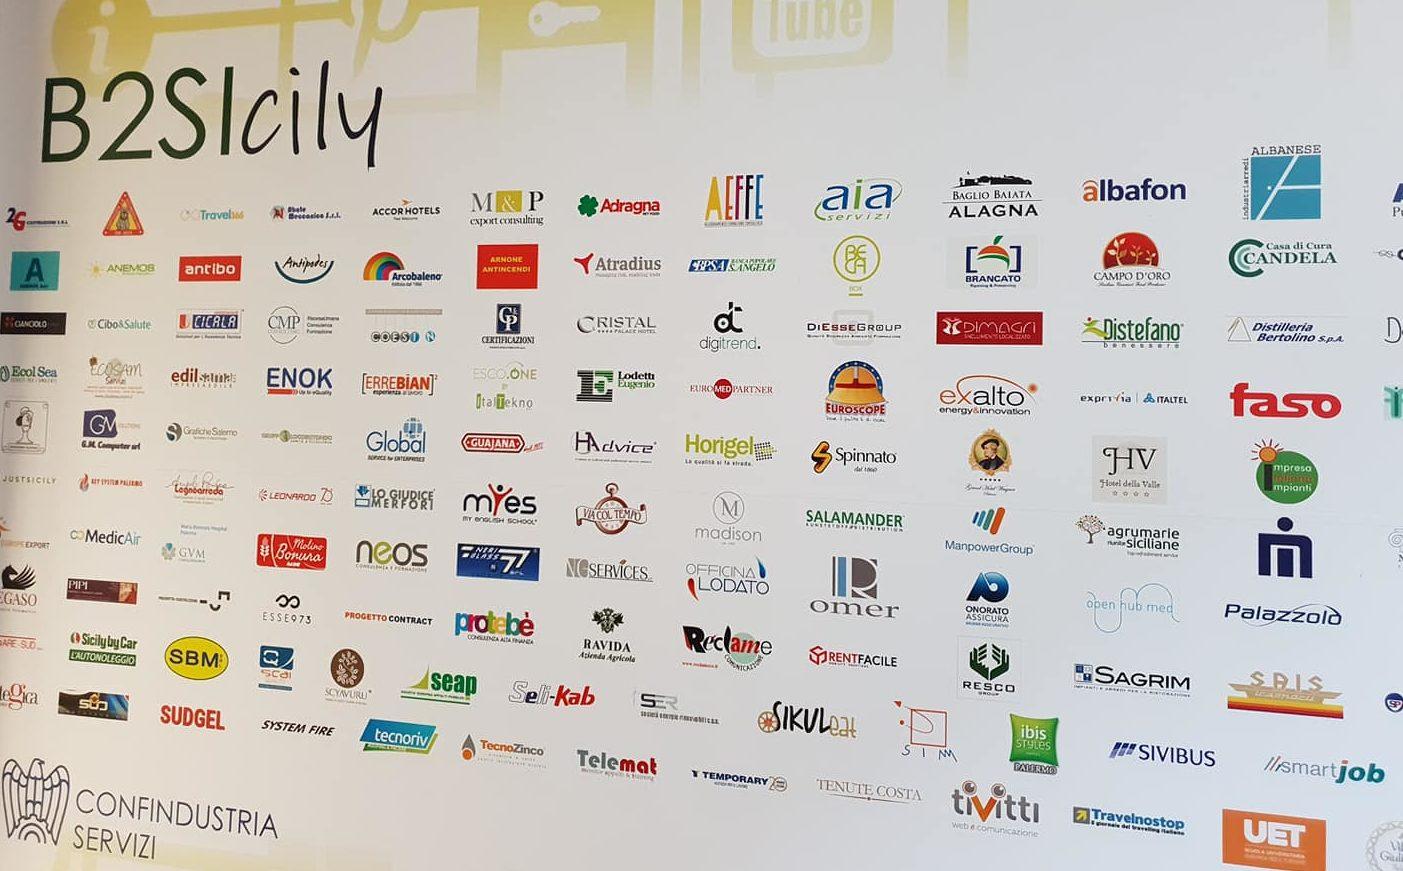 B2Sicily – Riceviamo da Sicindustria il premio #IMPRESAINNOVA